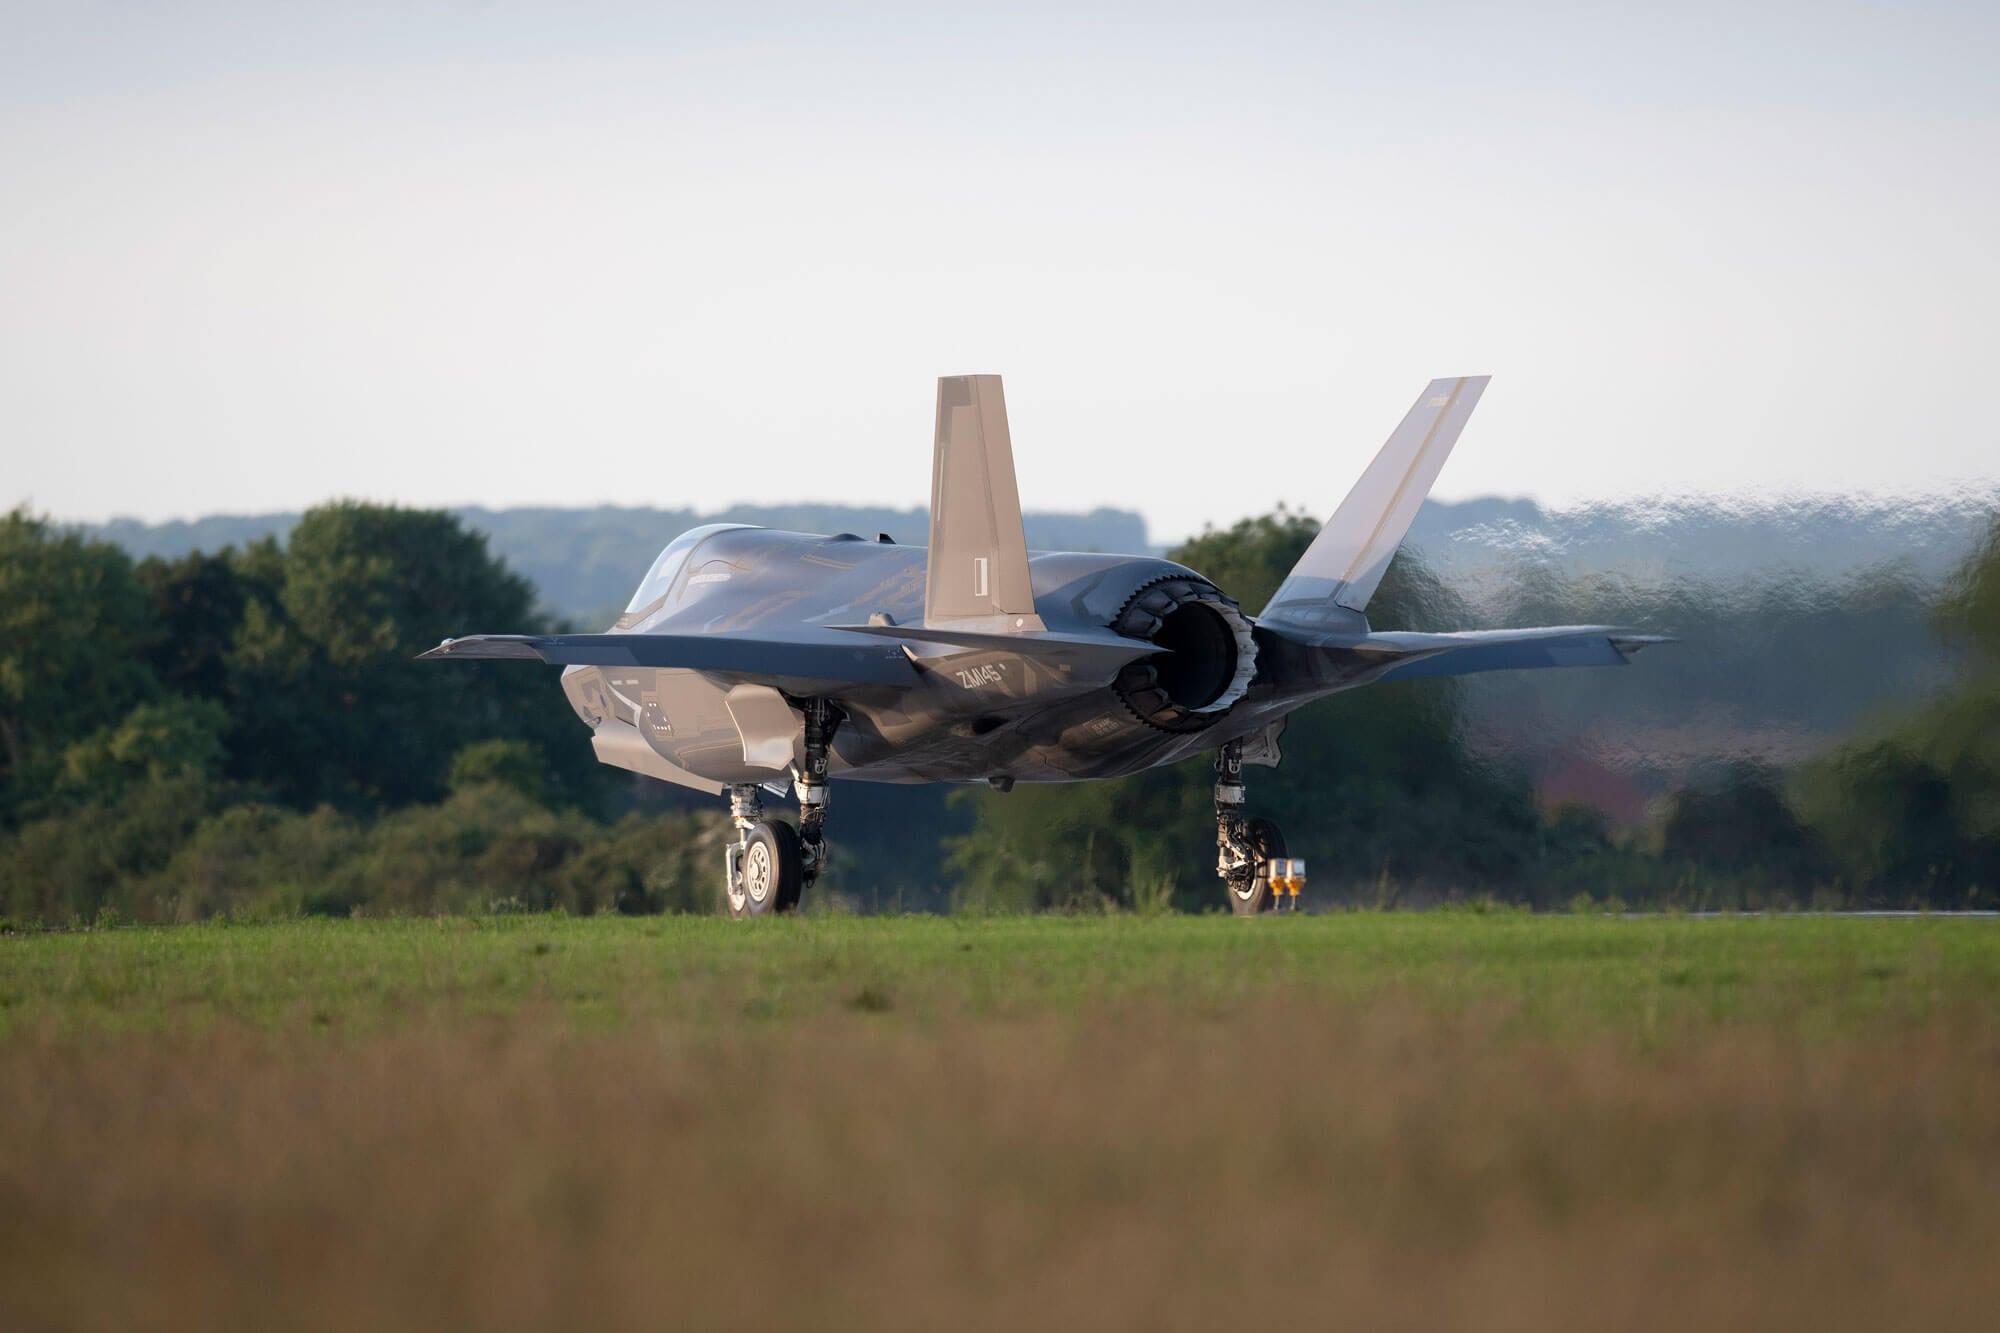 F-35 thrusters